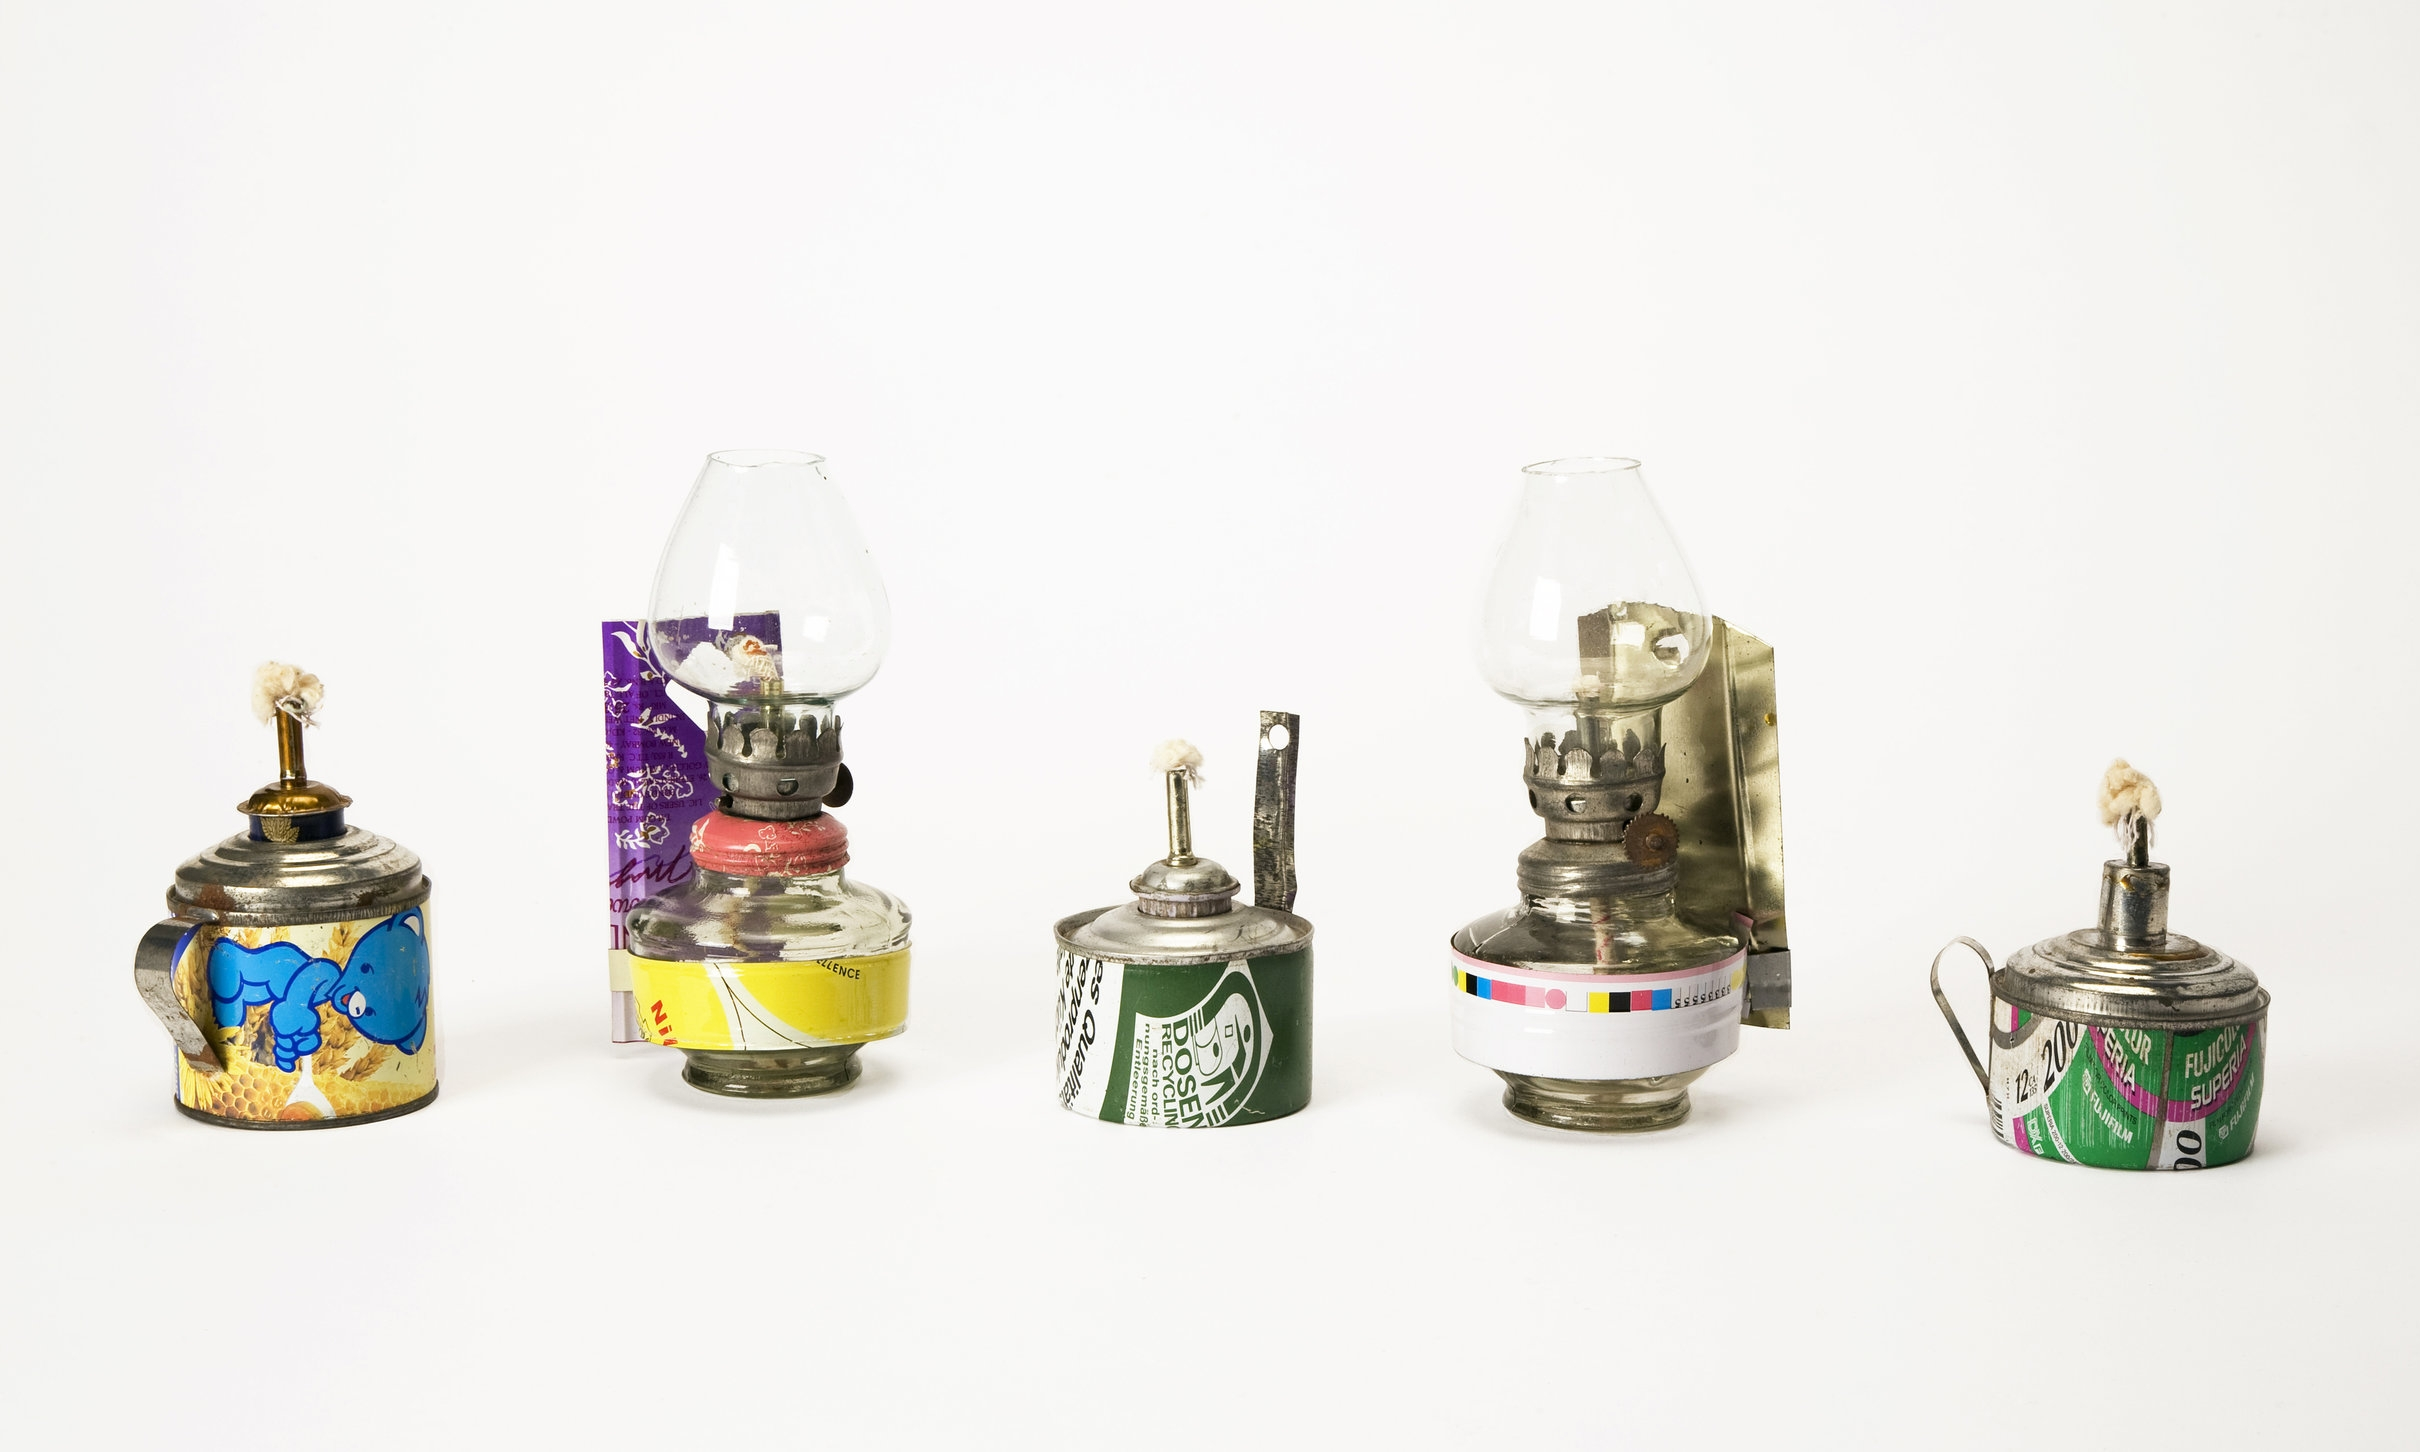 Kerosene lamps made from misprinted tin